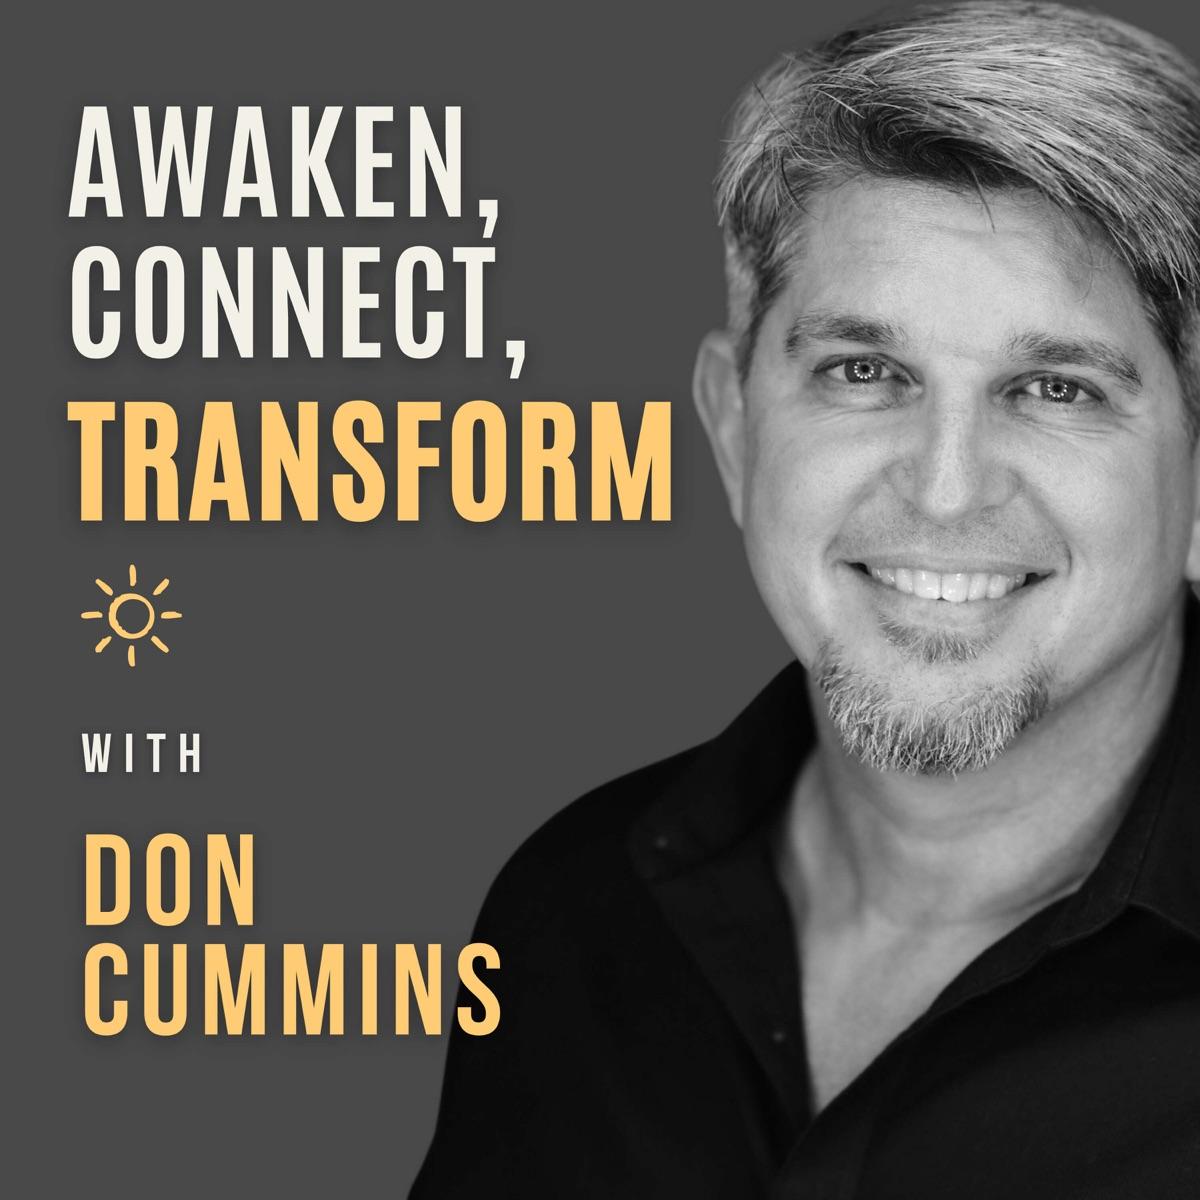 Awaken, Connect, Transform